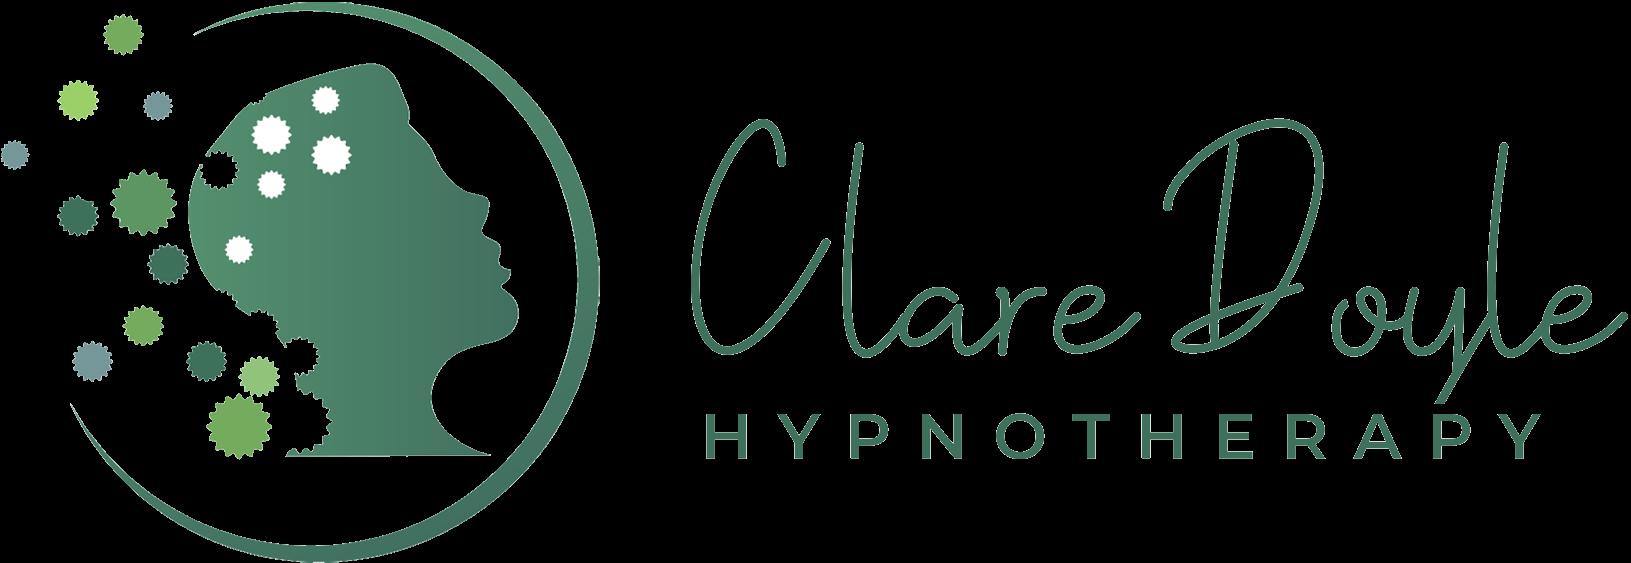 Clare Doyle Hypnotherapy